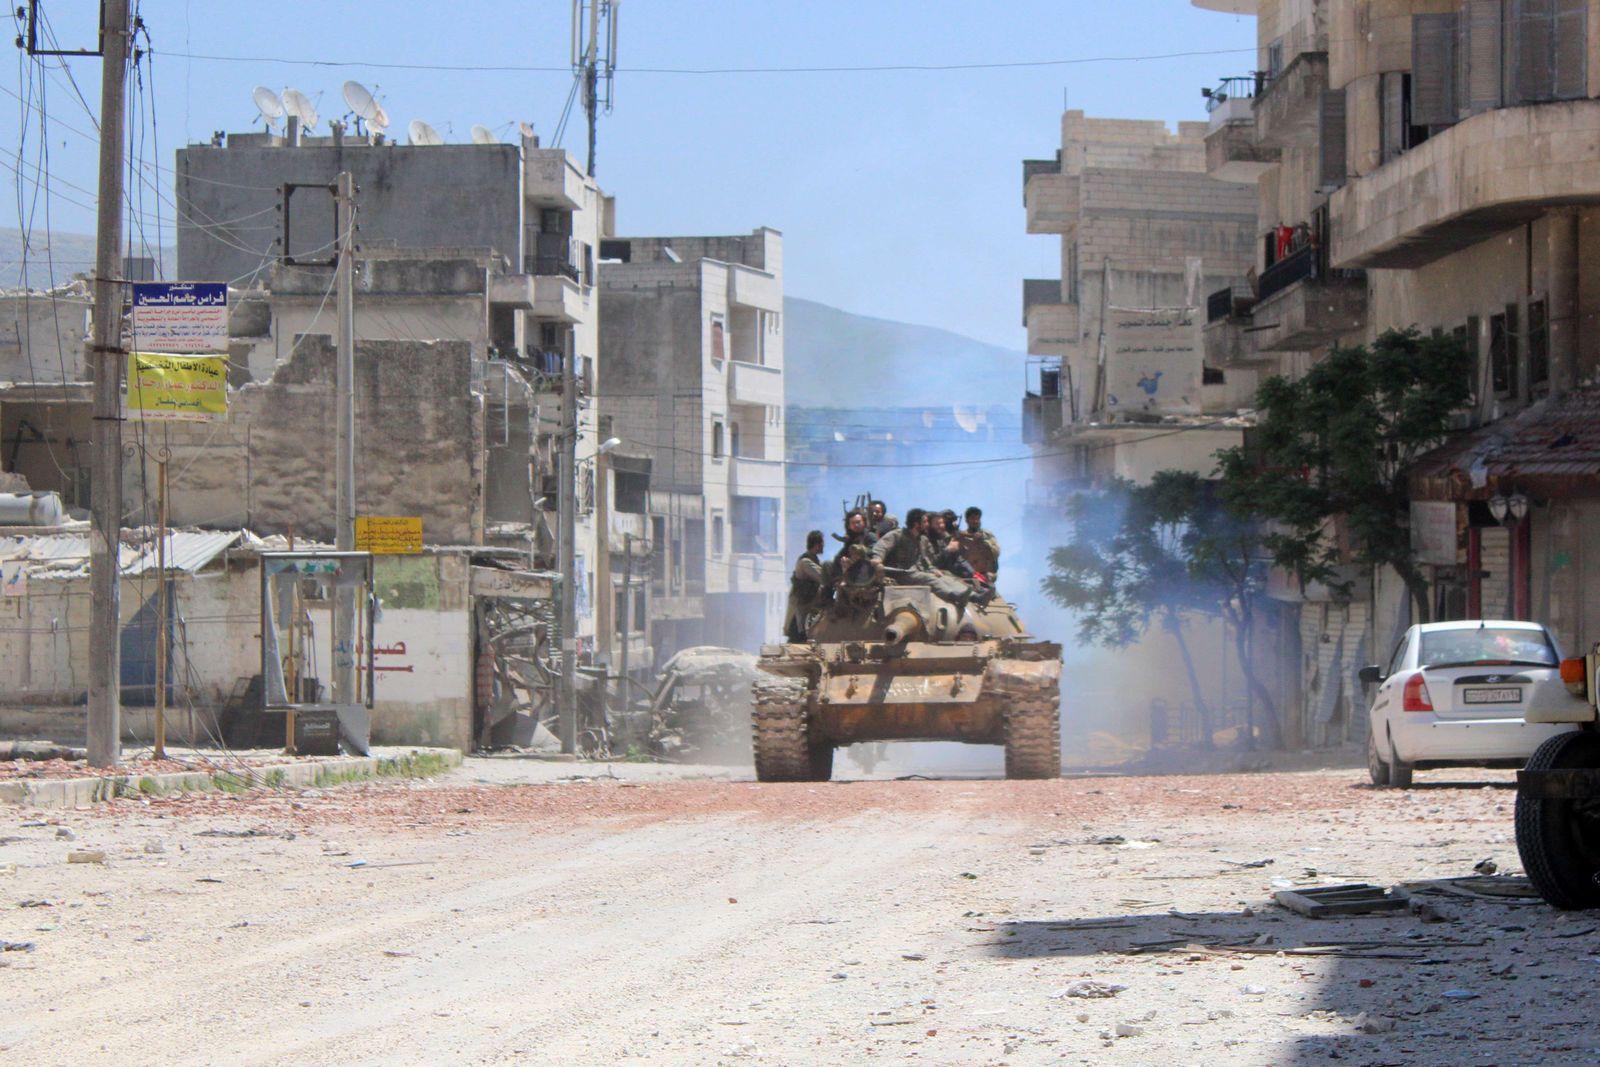 Syrien/ Jisr al-Shughur